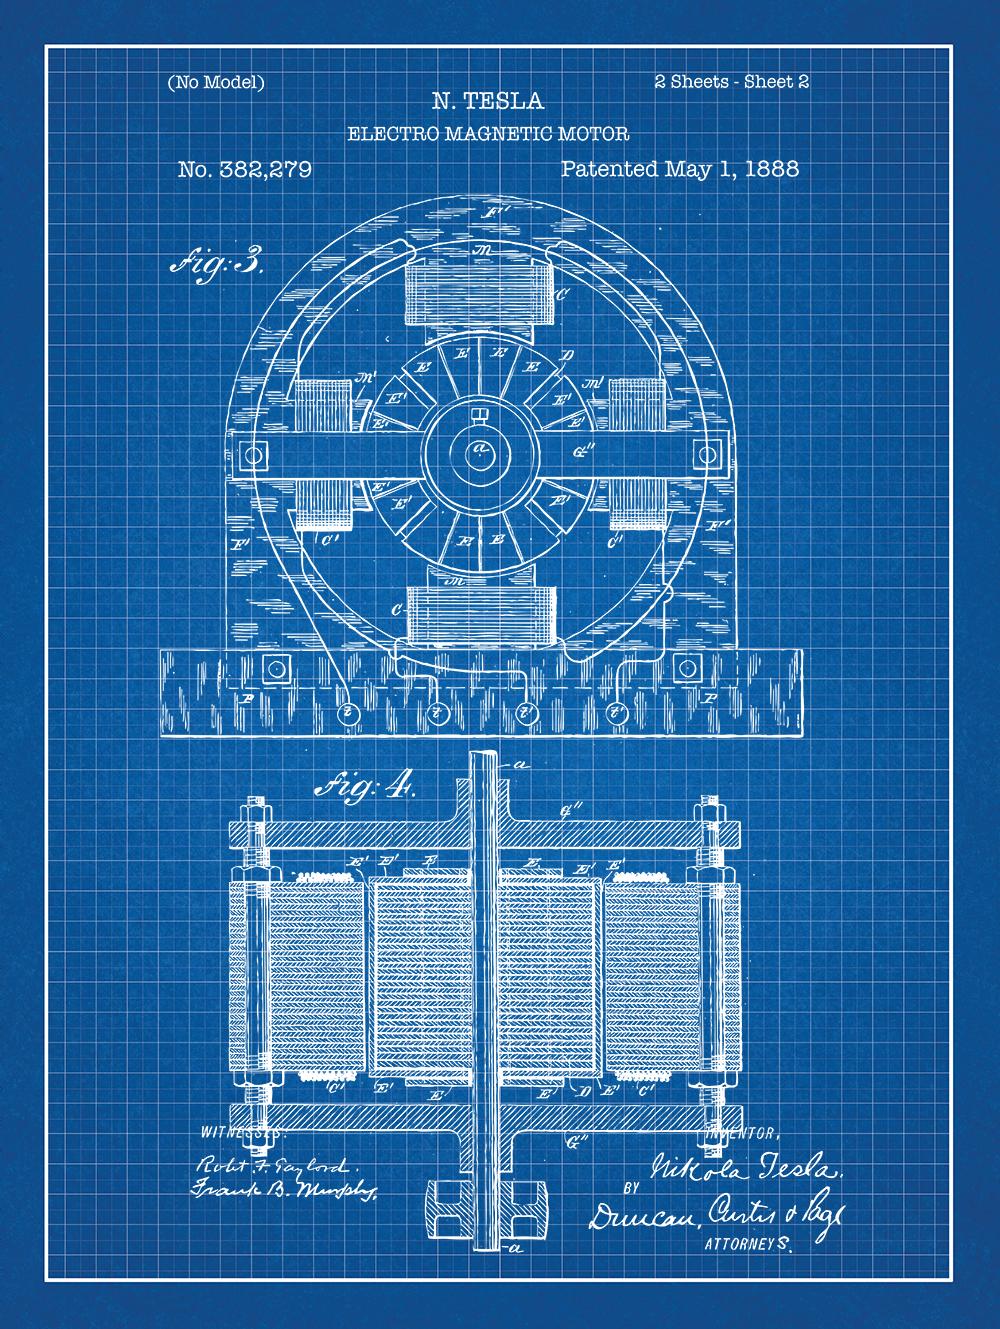 Tesla Electromagnet Motor Patent Vintage Poster Screen Print Design Diagram Pics Electro Magnet On Blue Graph Paper Background